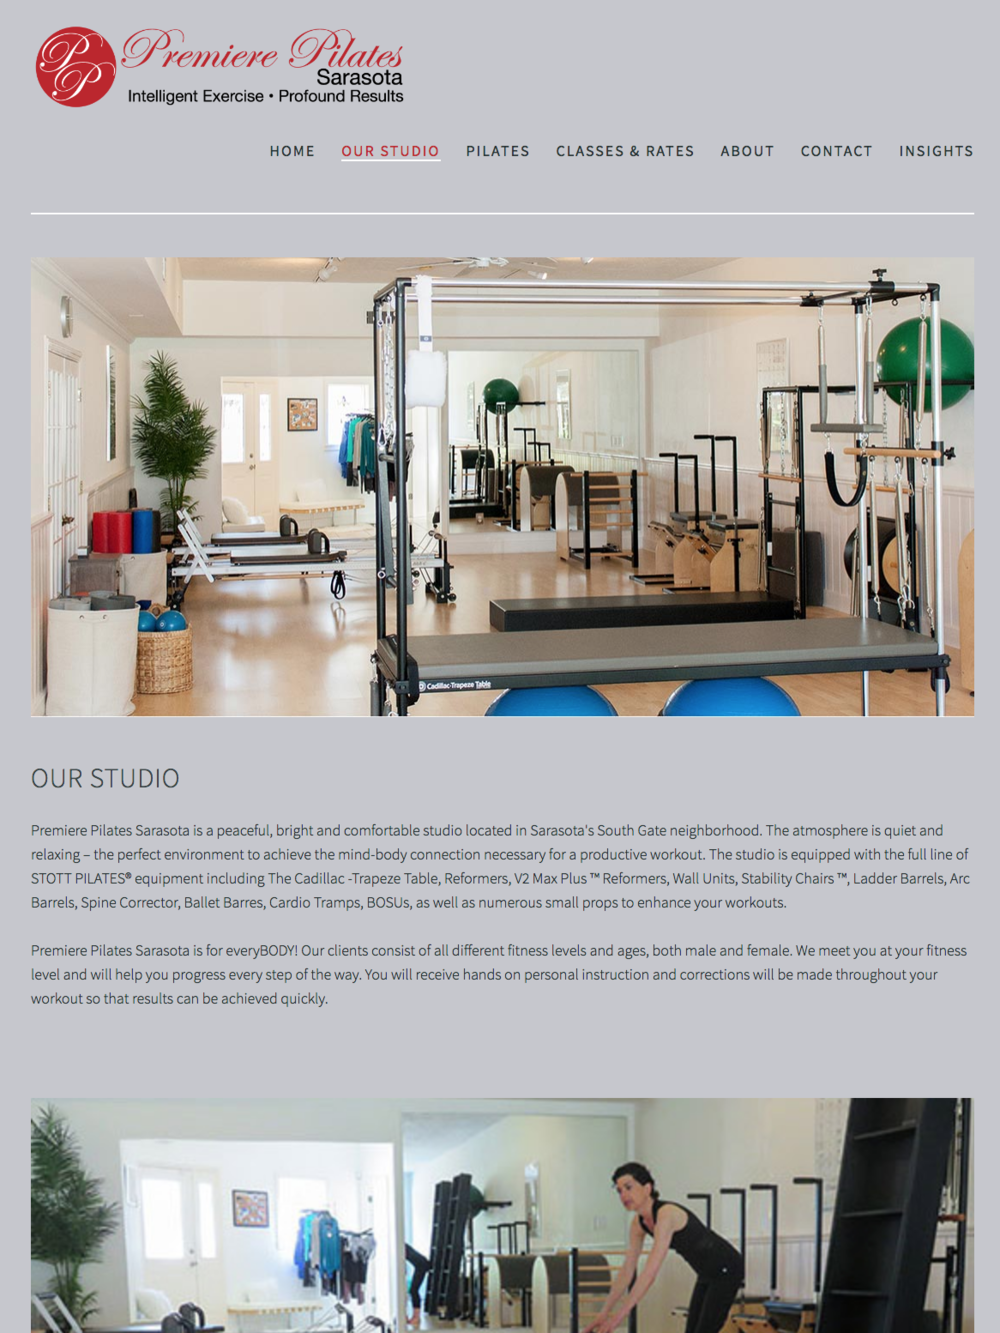 premiere-pilates-sarasota-studio-page.png